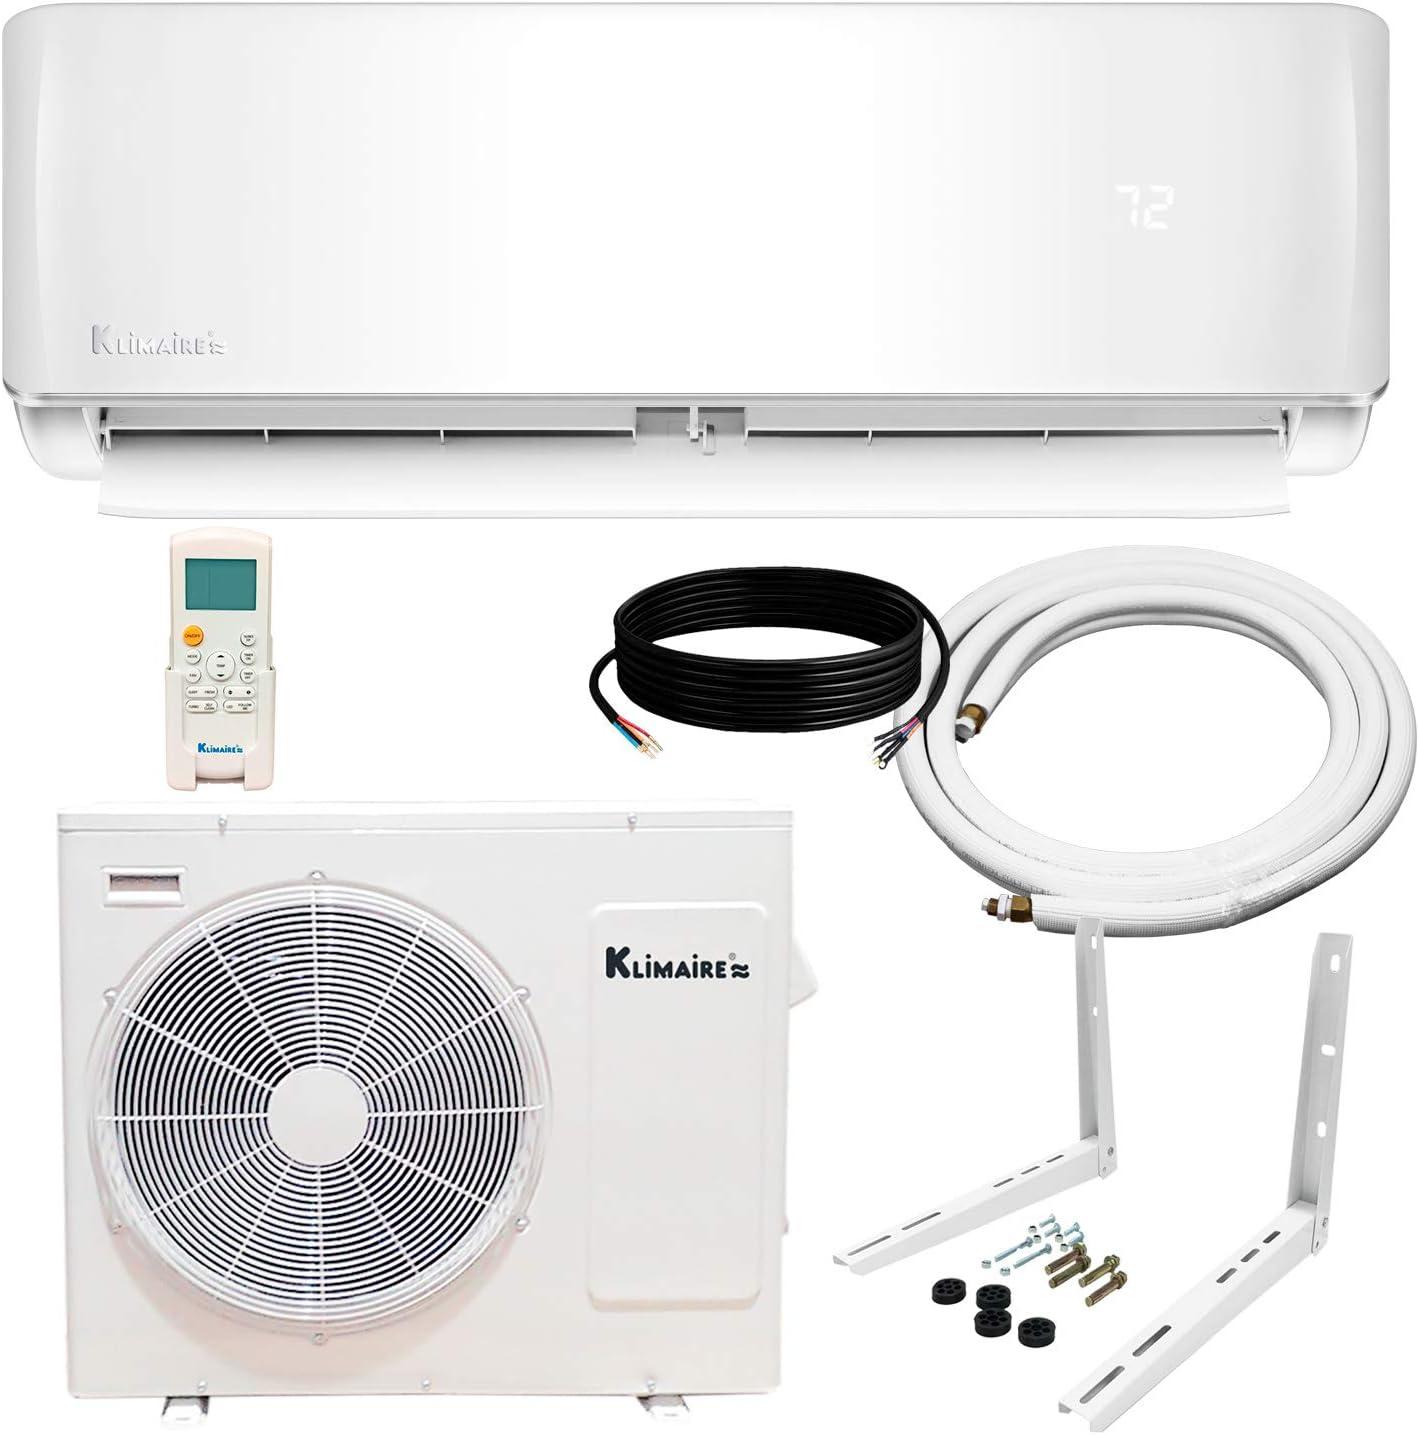 Klimaire 18,000 BTU 21 SEER Ductless Mini-Split Inverter Air Conditioner Heat Pump System with 15 ft Installation Kit (230 Volt) Wi-Fi Ready